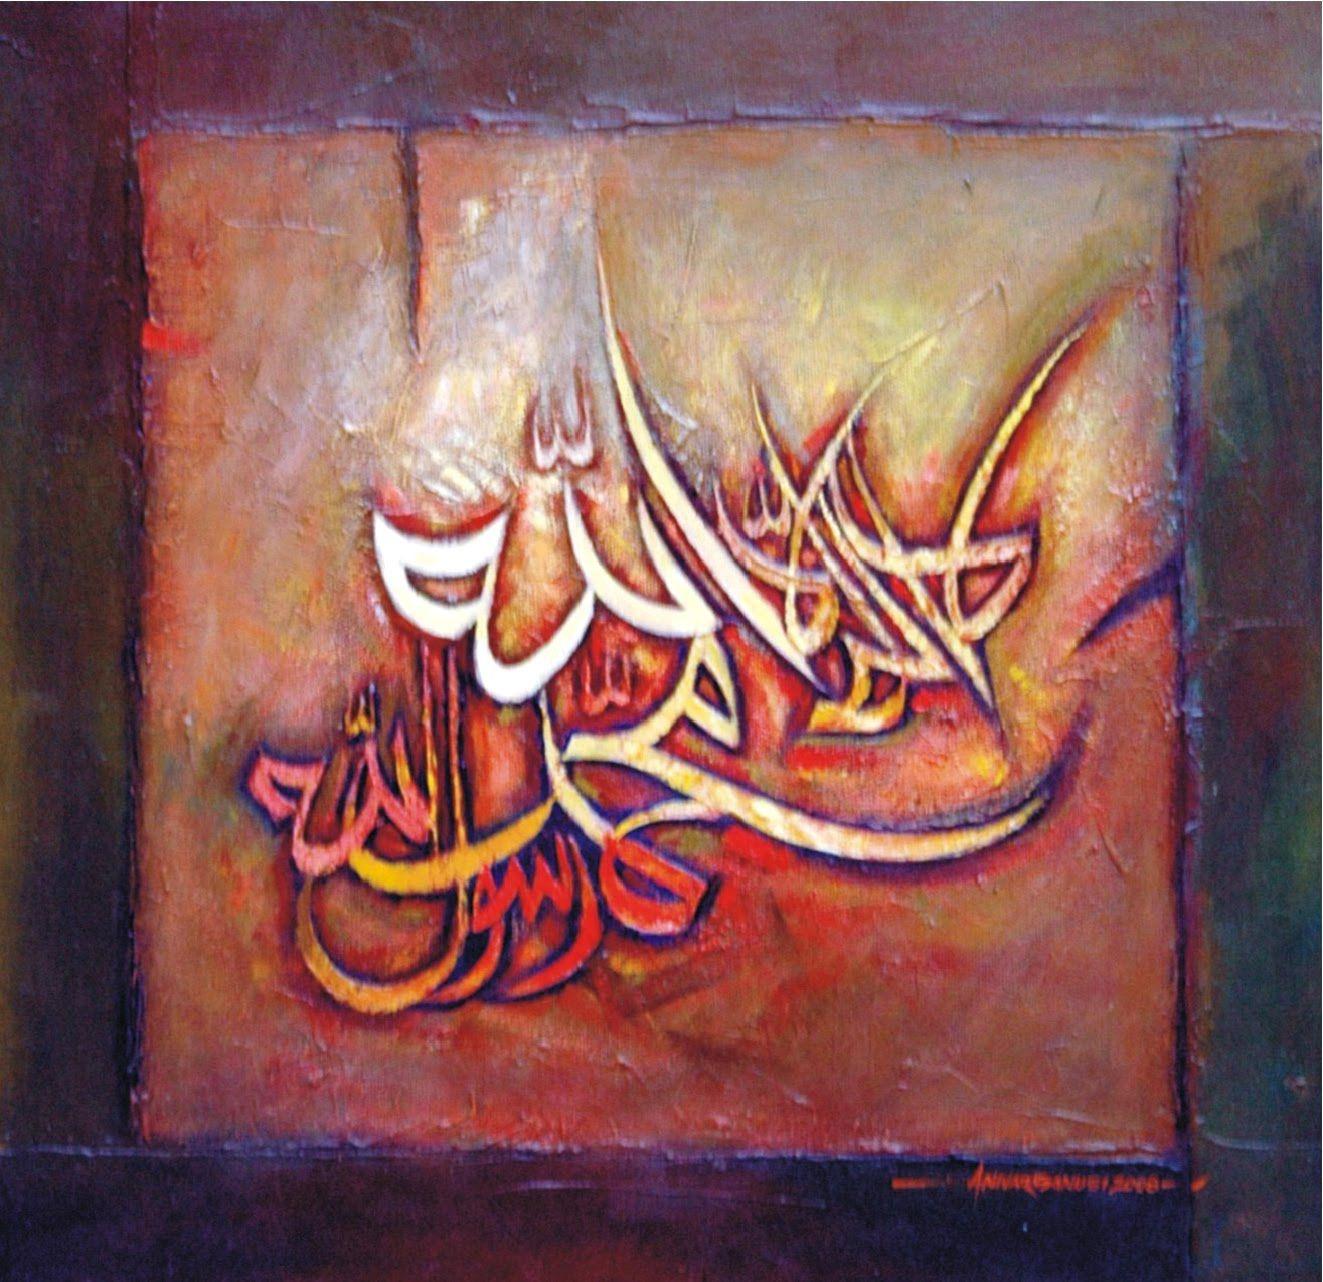 Pin oleh Syahrul di lukisan kaligrafi Kaligrafi, Lukisan